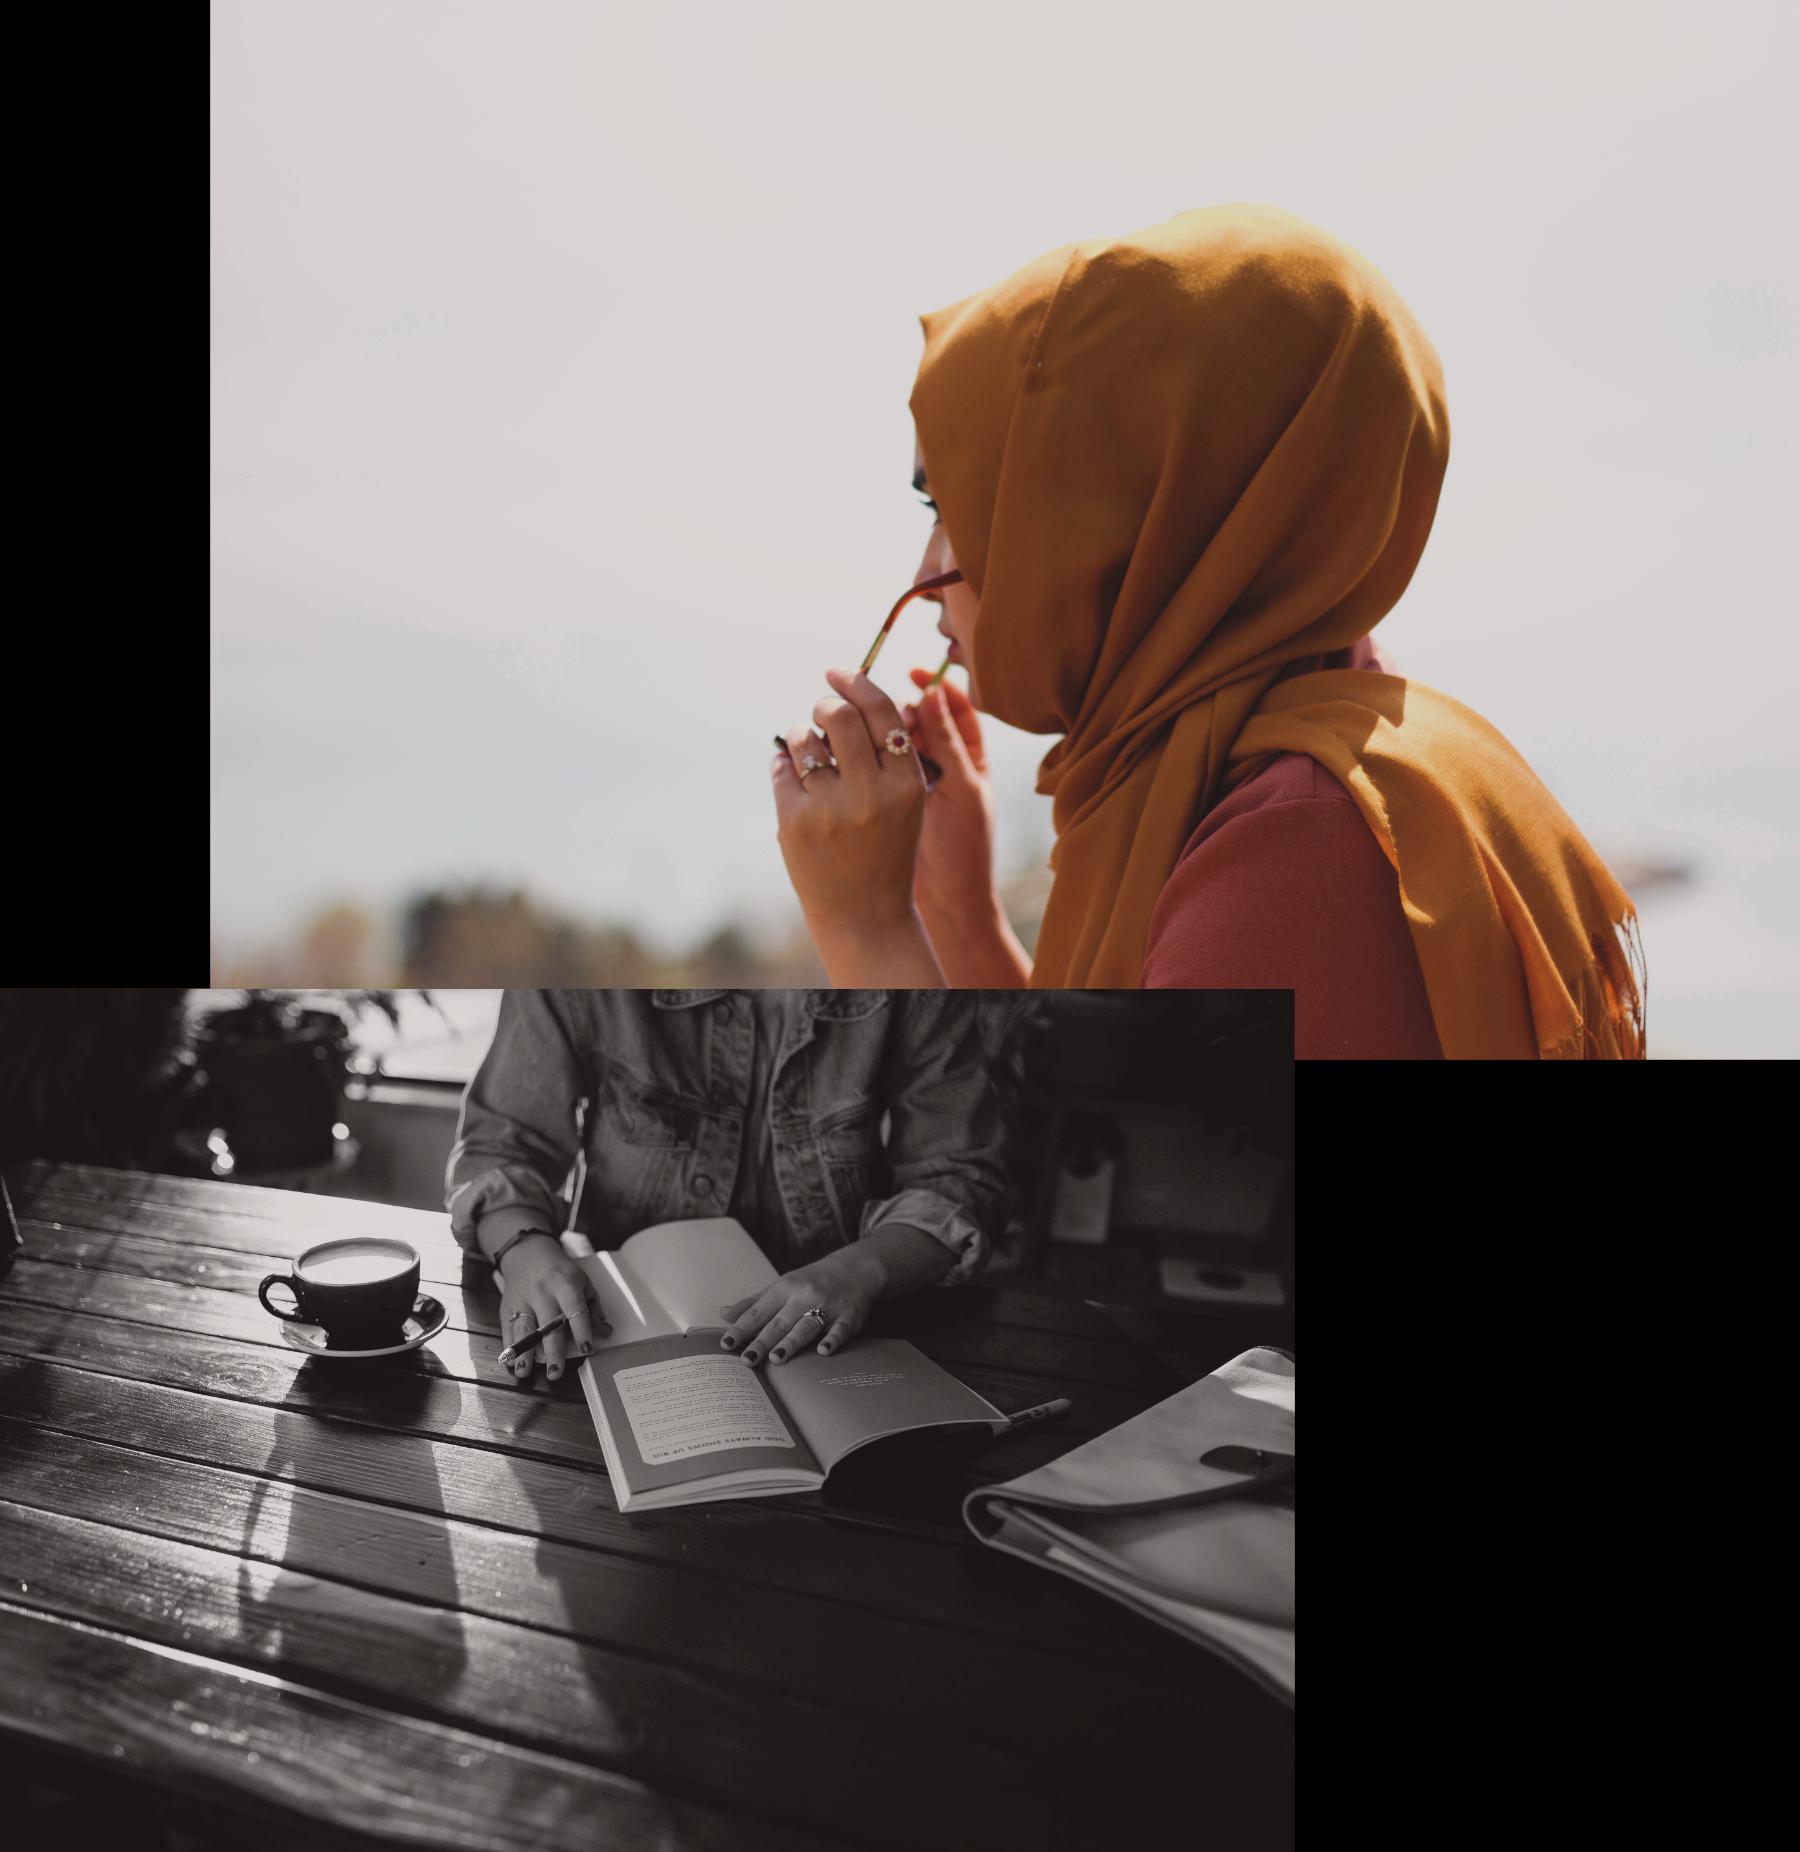 15-hijab-photo-02.png